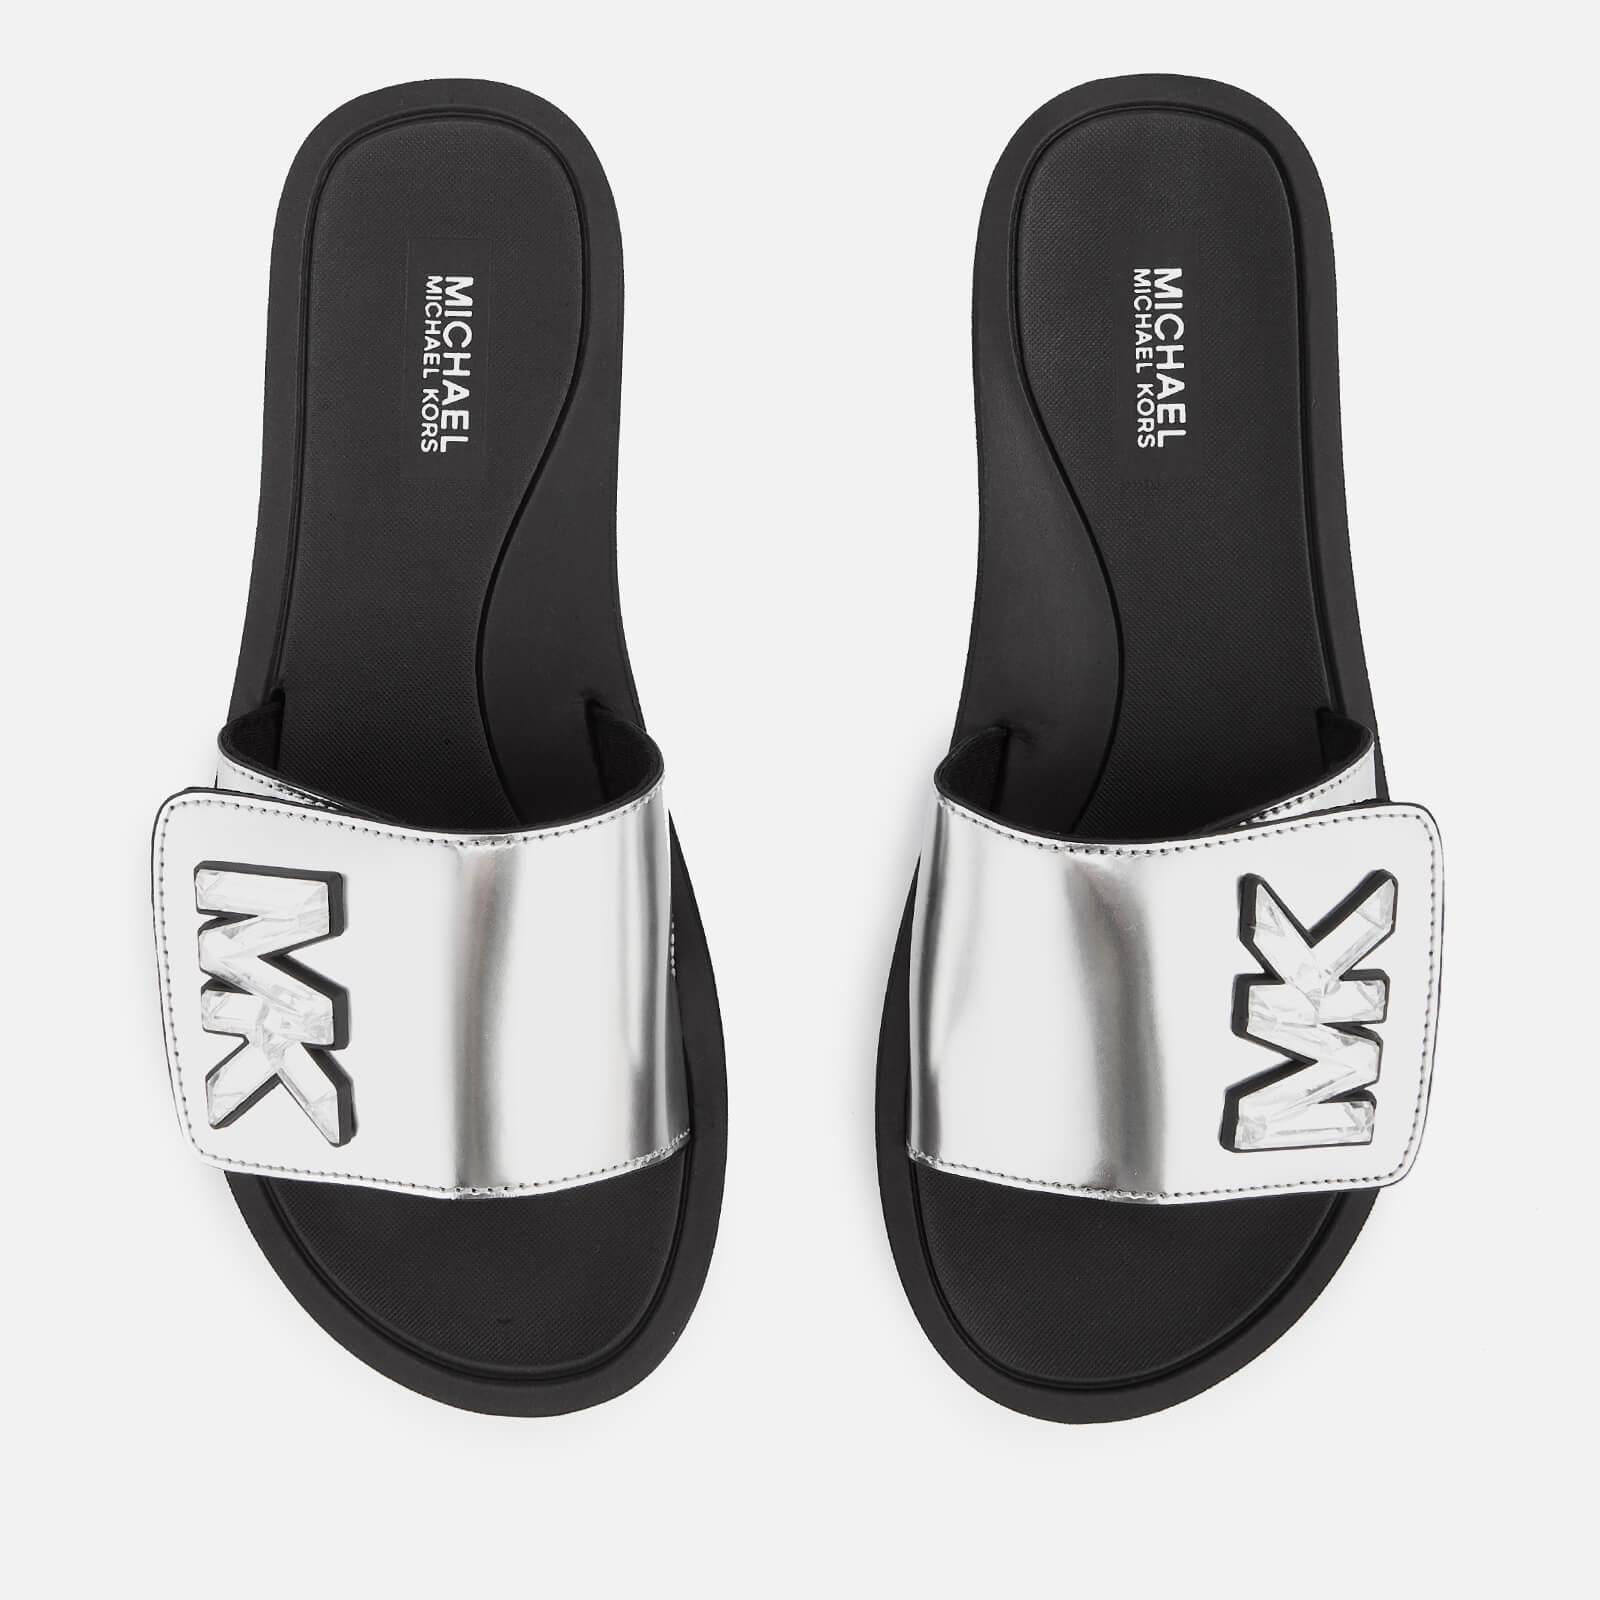 MICHAEL MICHAEL KORS Women's MK Slide Sandals - Silver - UK 7/US 10 - Silver